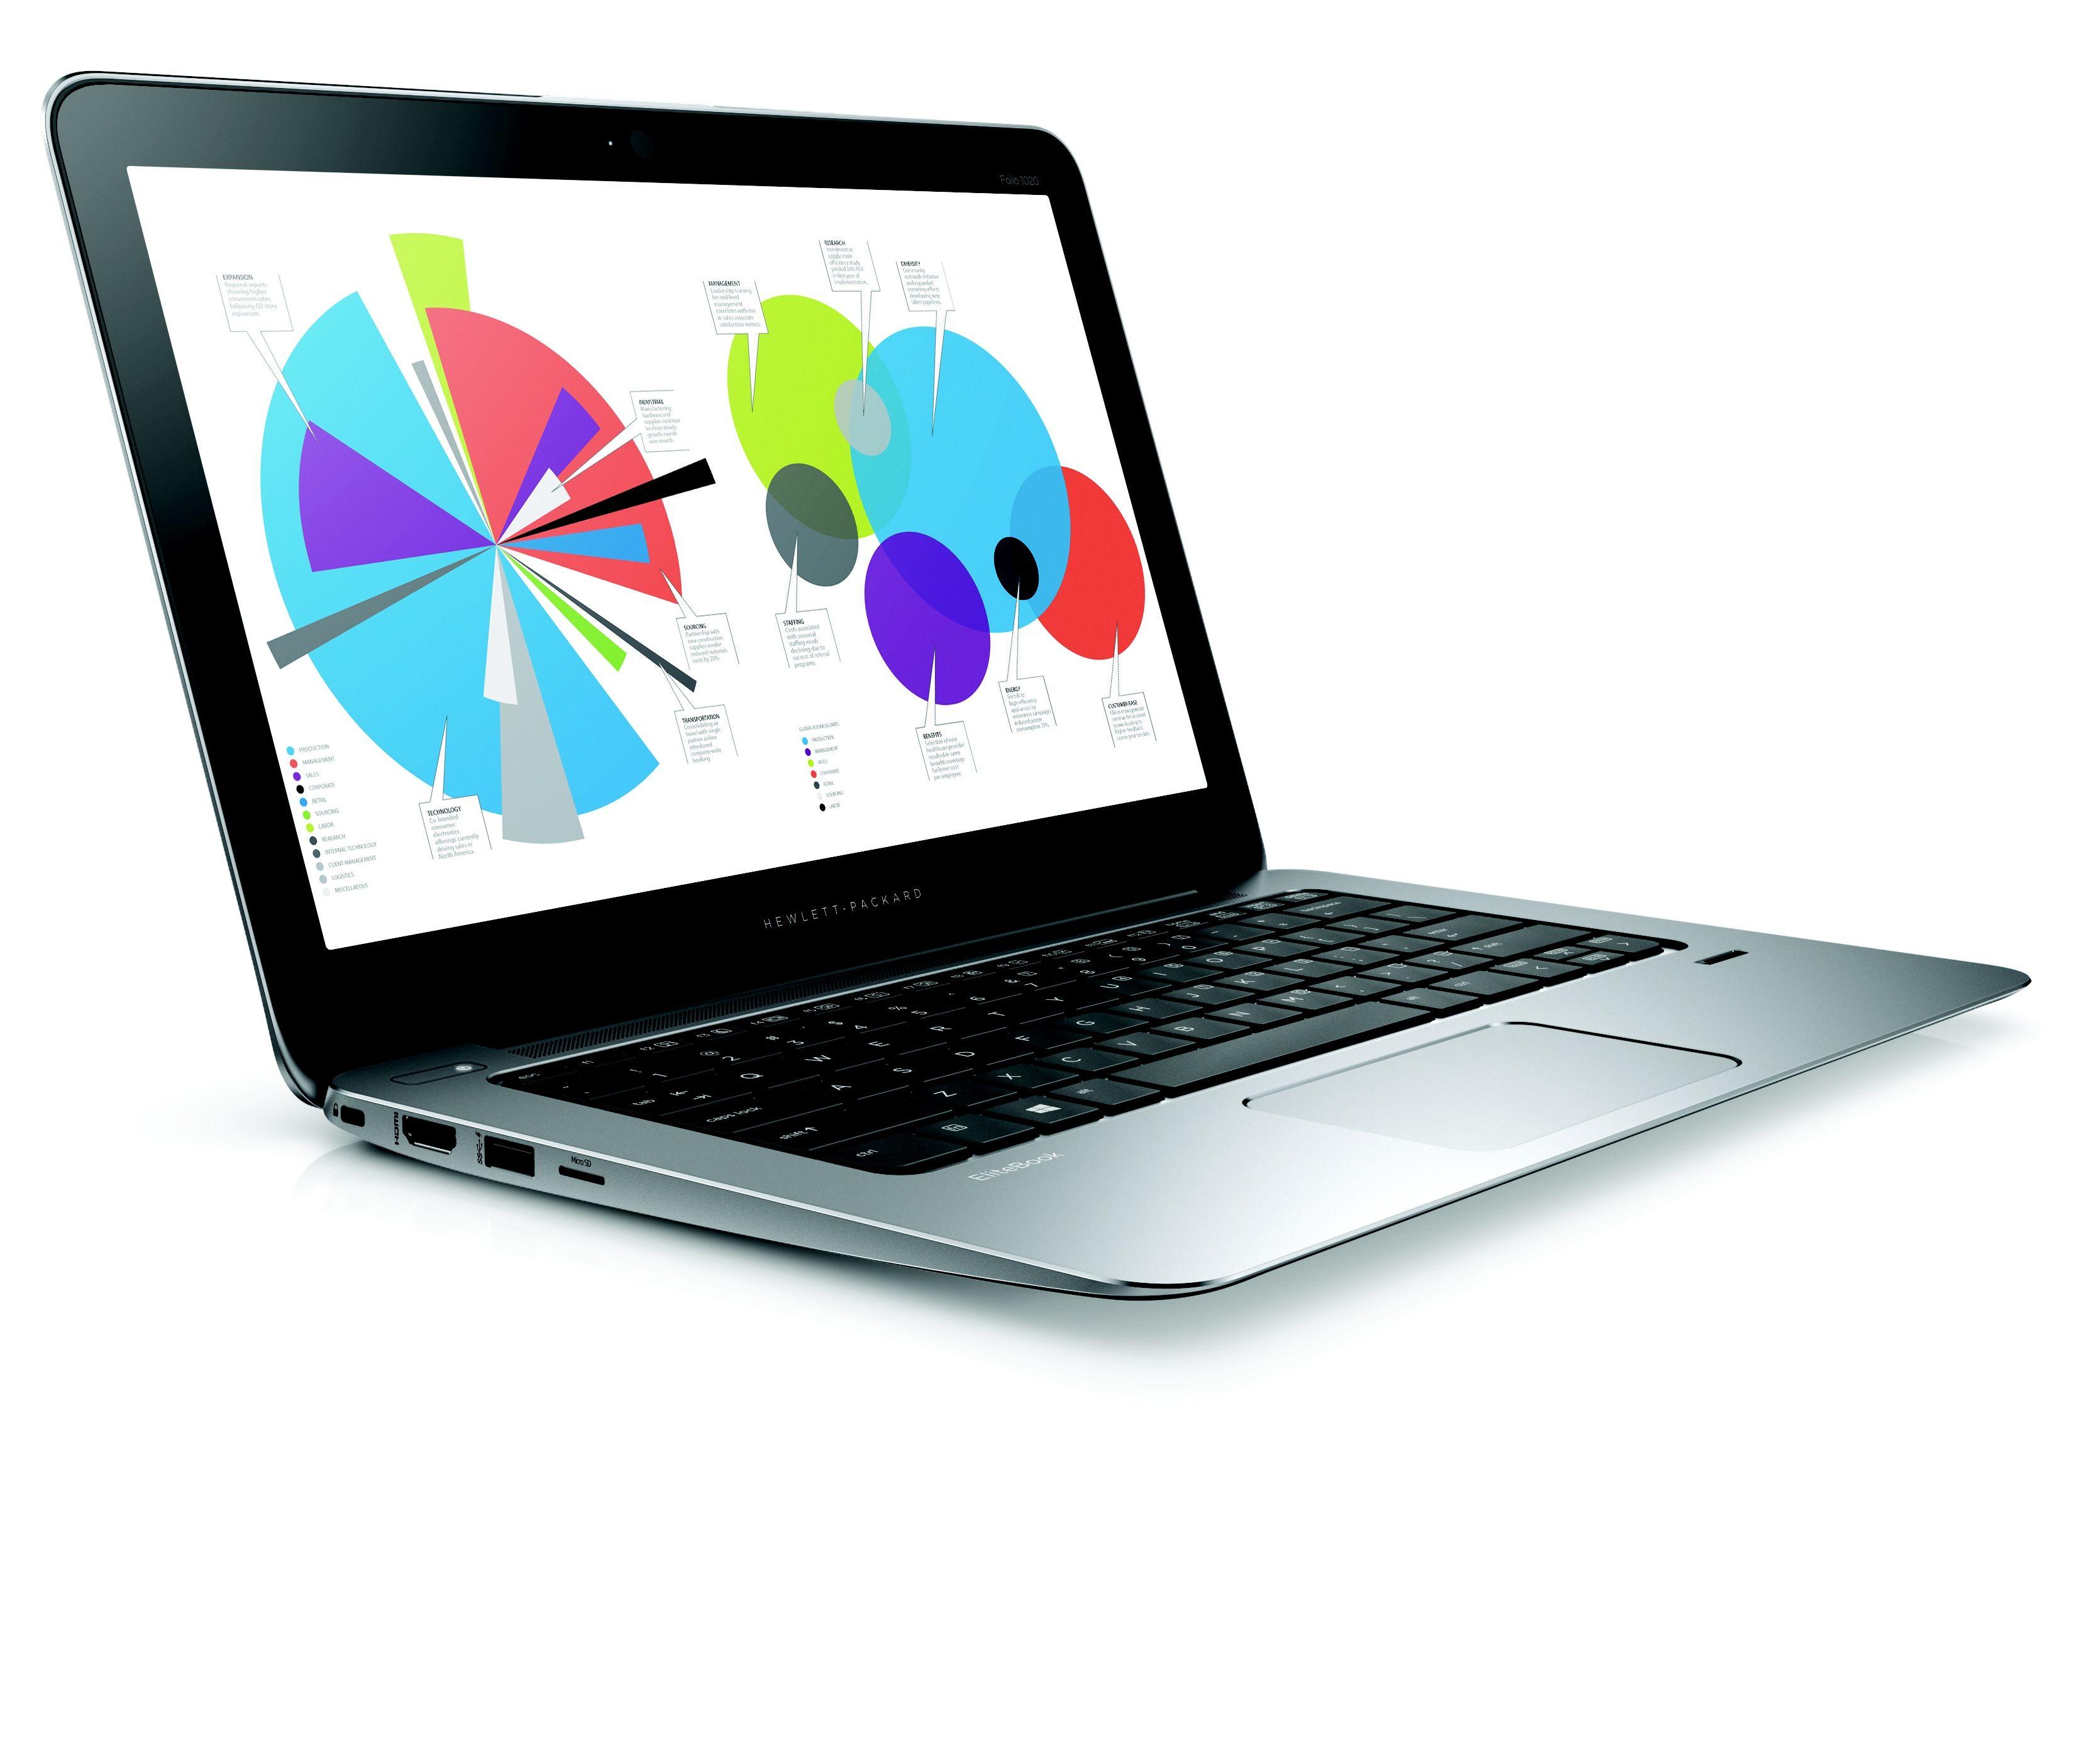 "HP Folio 1020 G1 12.5"" QHD/M-5Y51/8GB/180SSD/HDMI/MCR/WIFI/BT/NFC/MCR/FPR/3Rservis/7+8.1P"